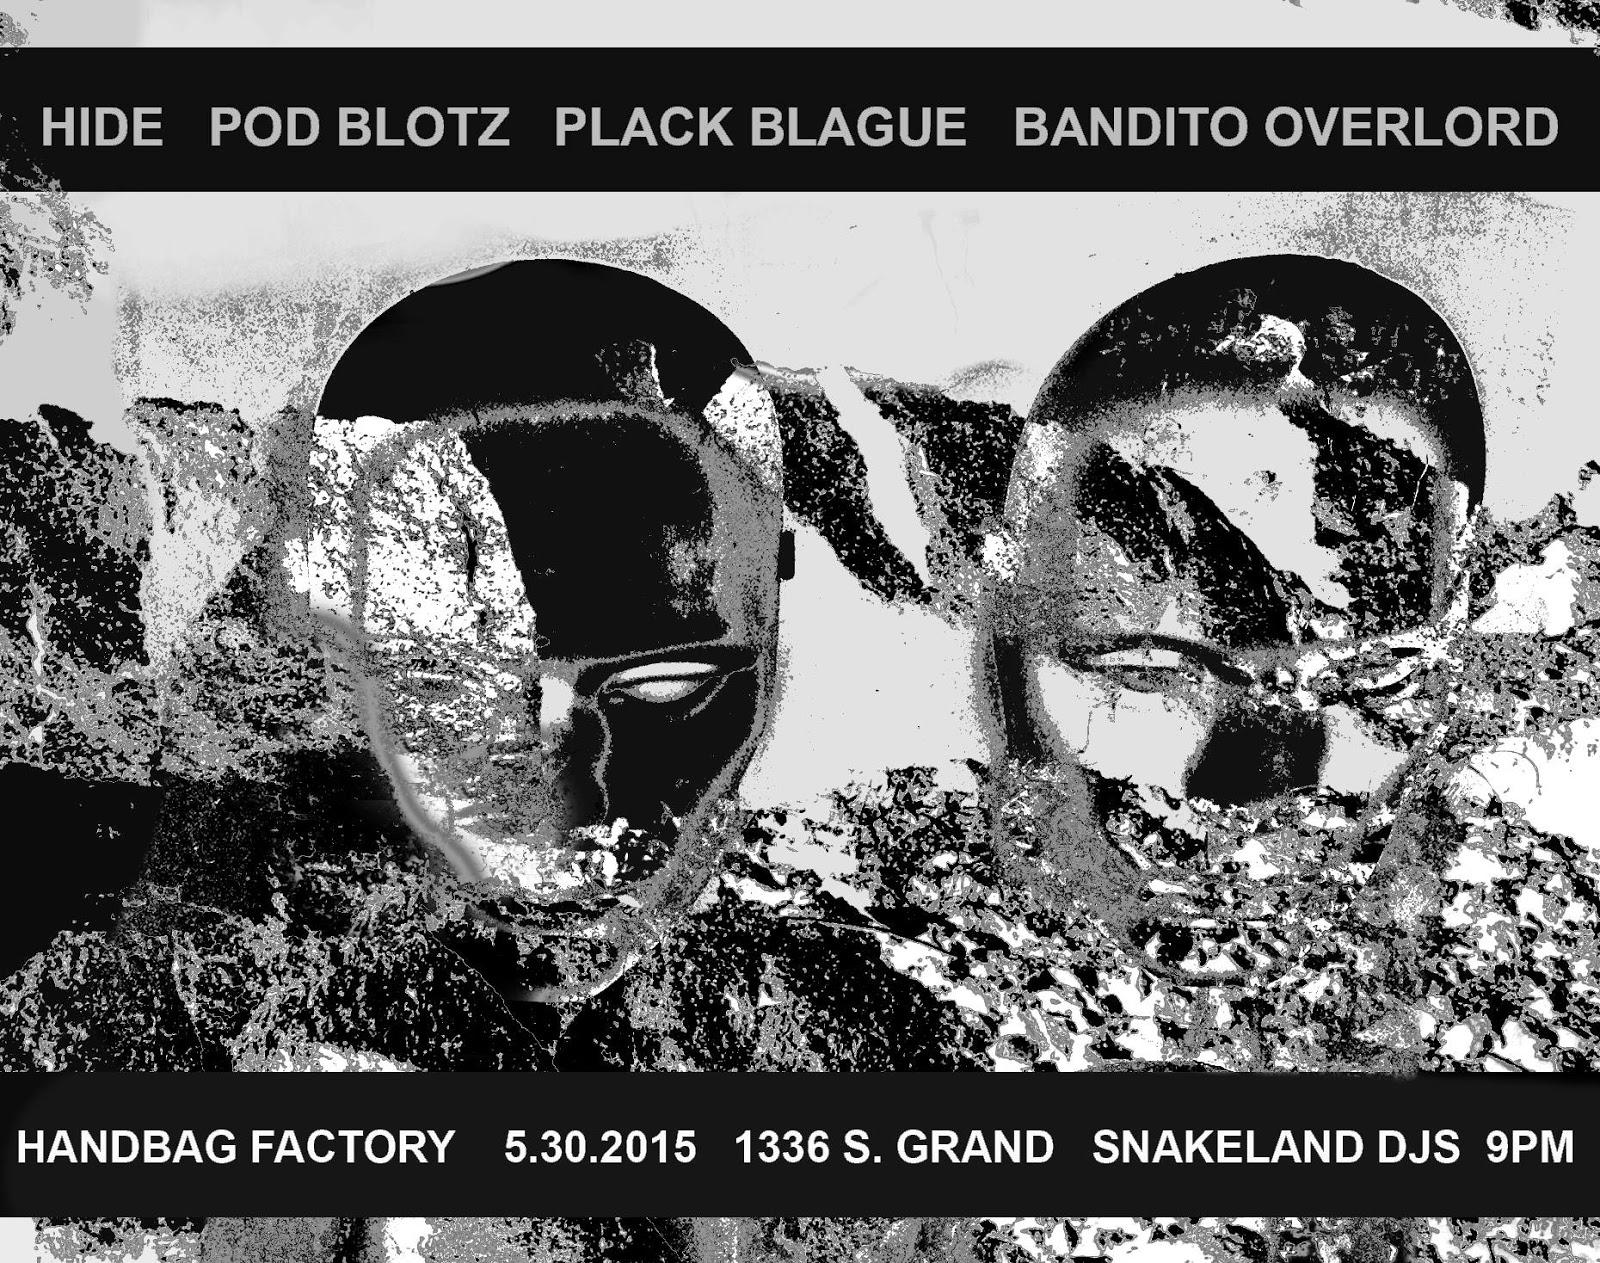 5 30 15 Plack Blague Bandito Overlord Hide Pod Blotz